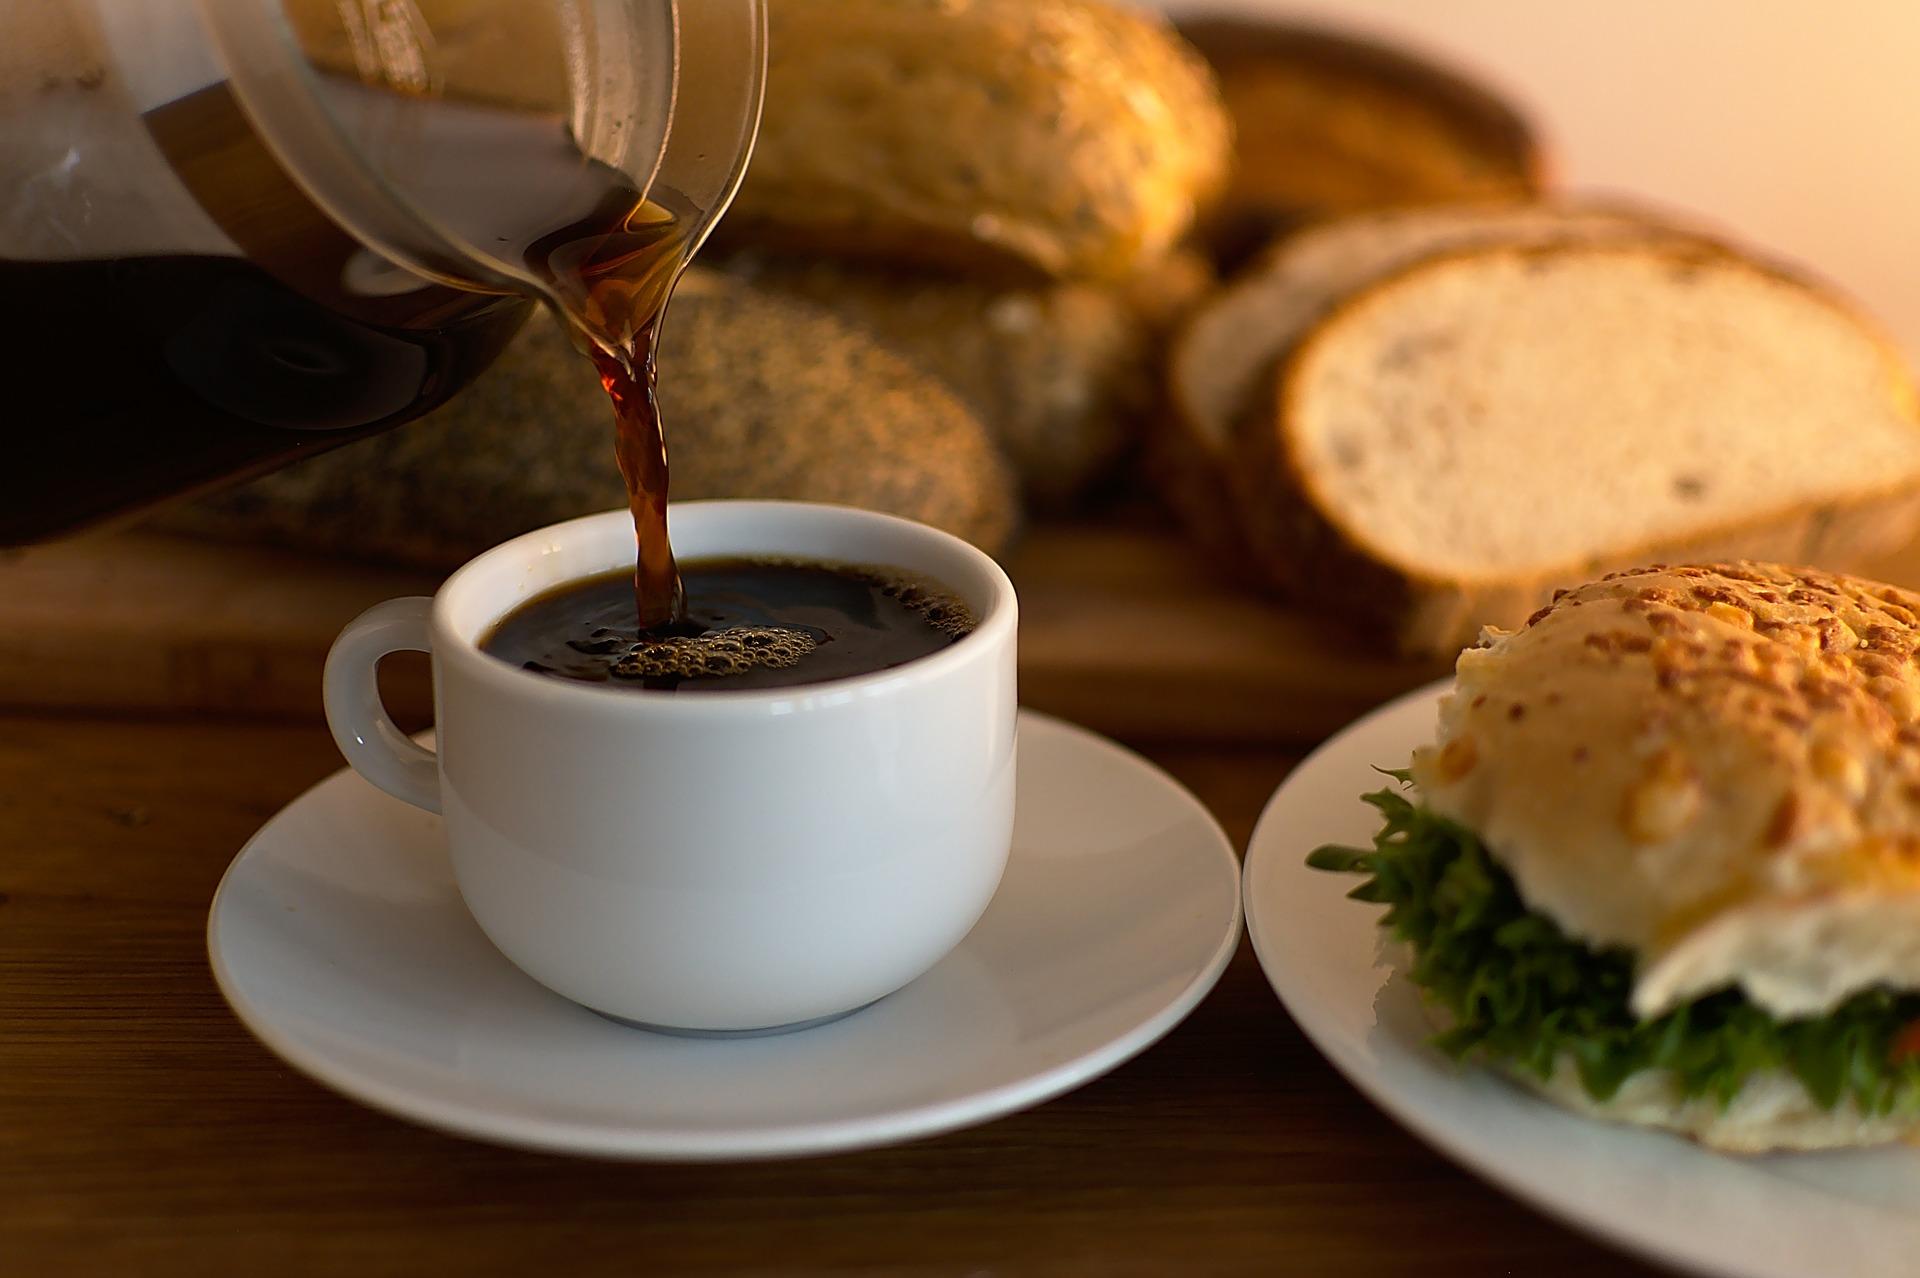 LUNCHA I VÅRT NYRENOVERADE CAFÉ